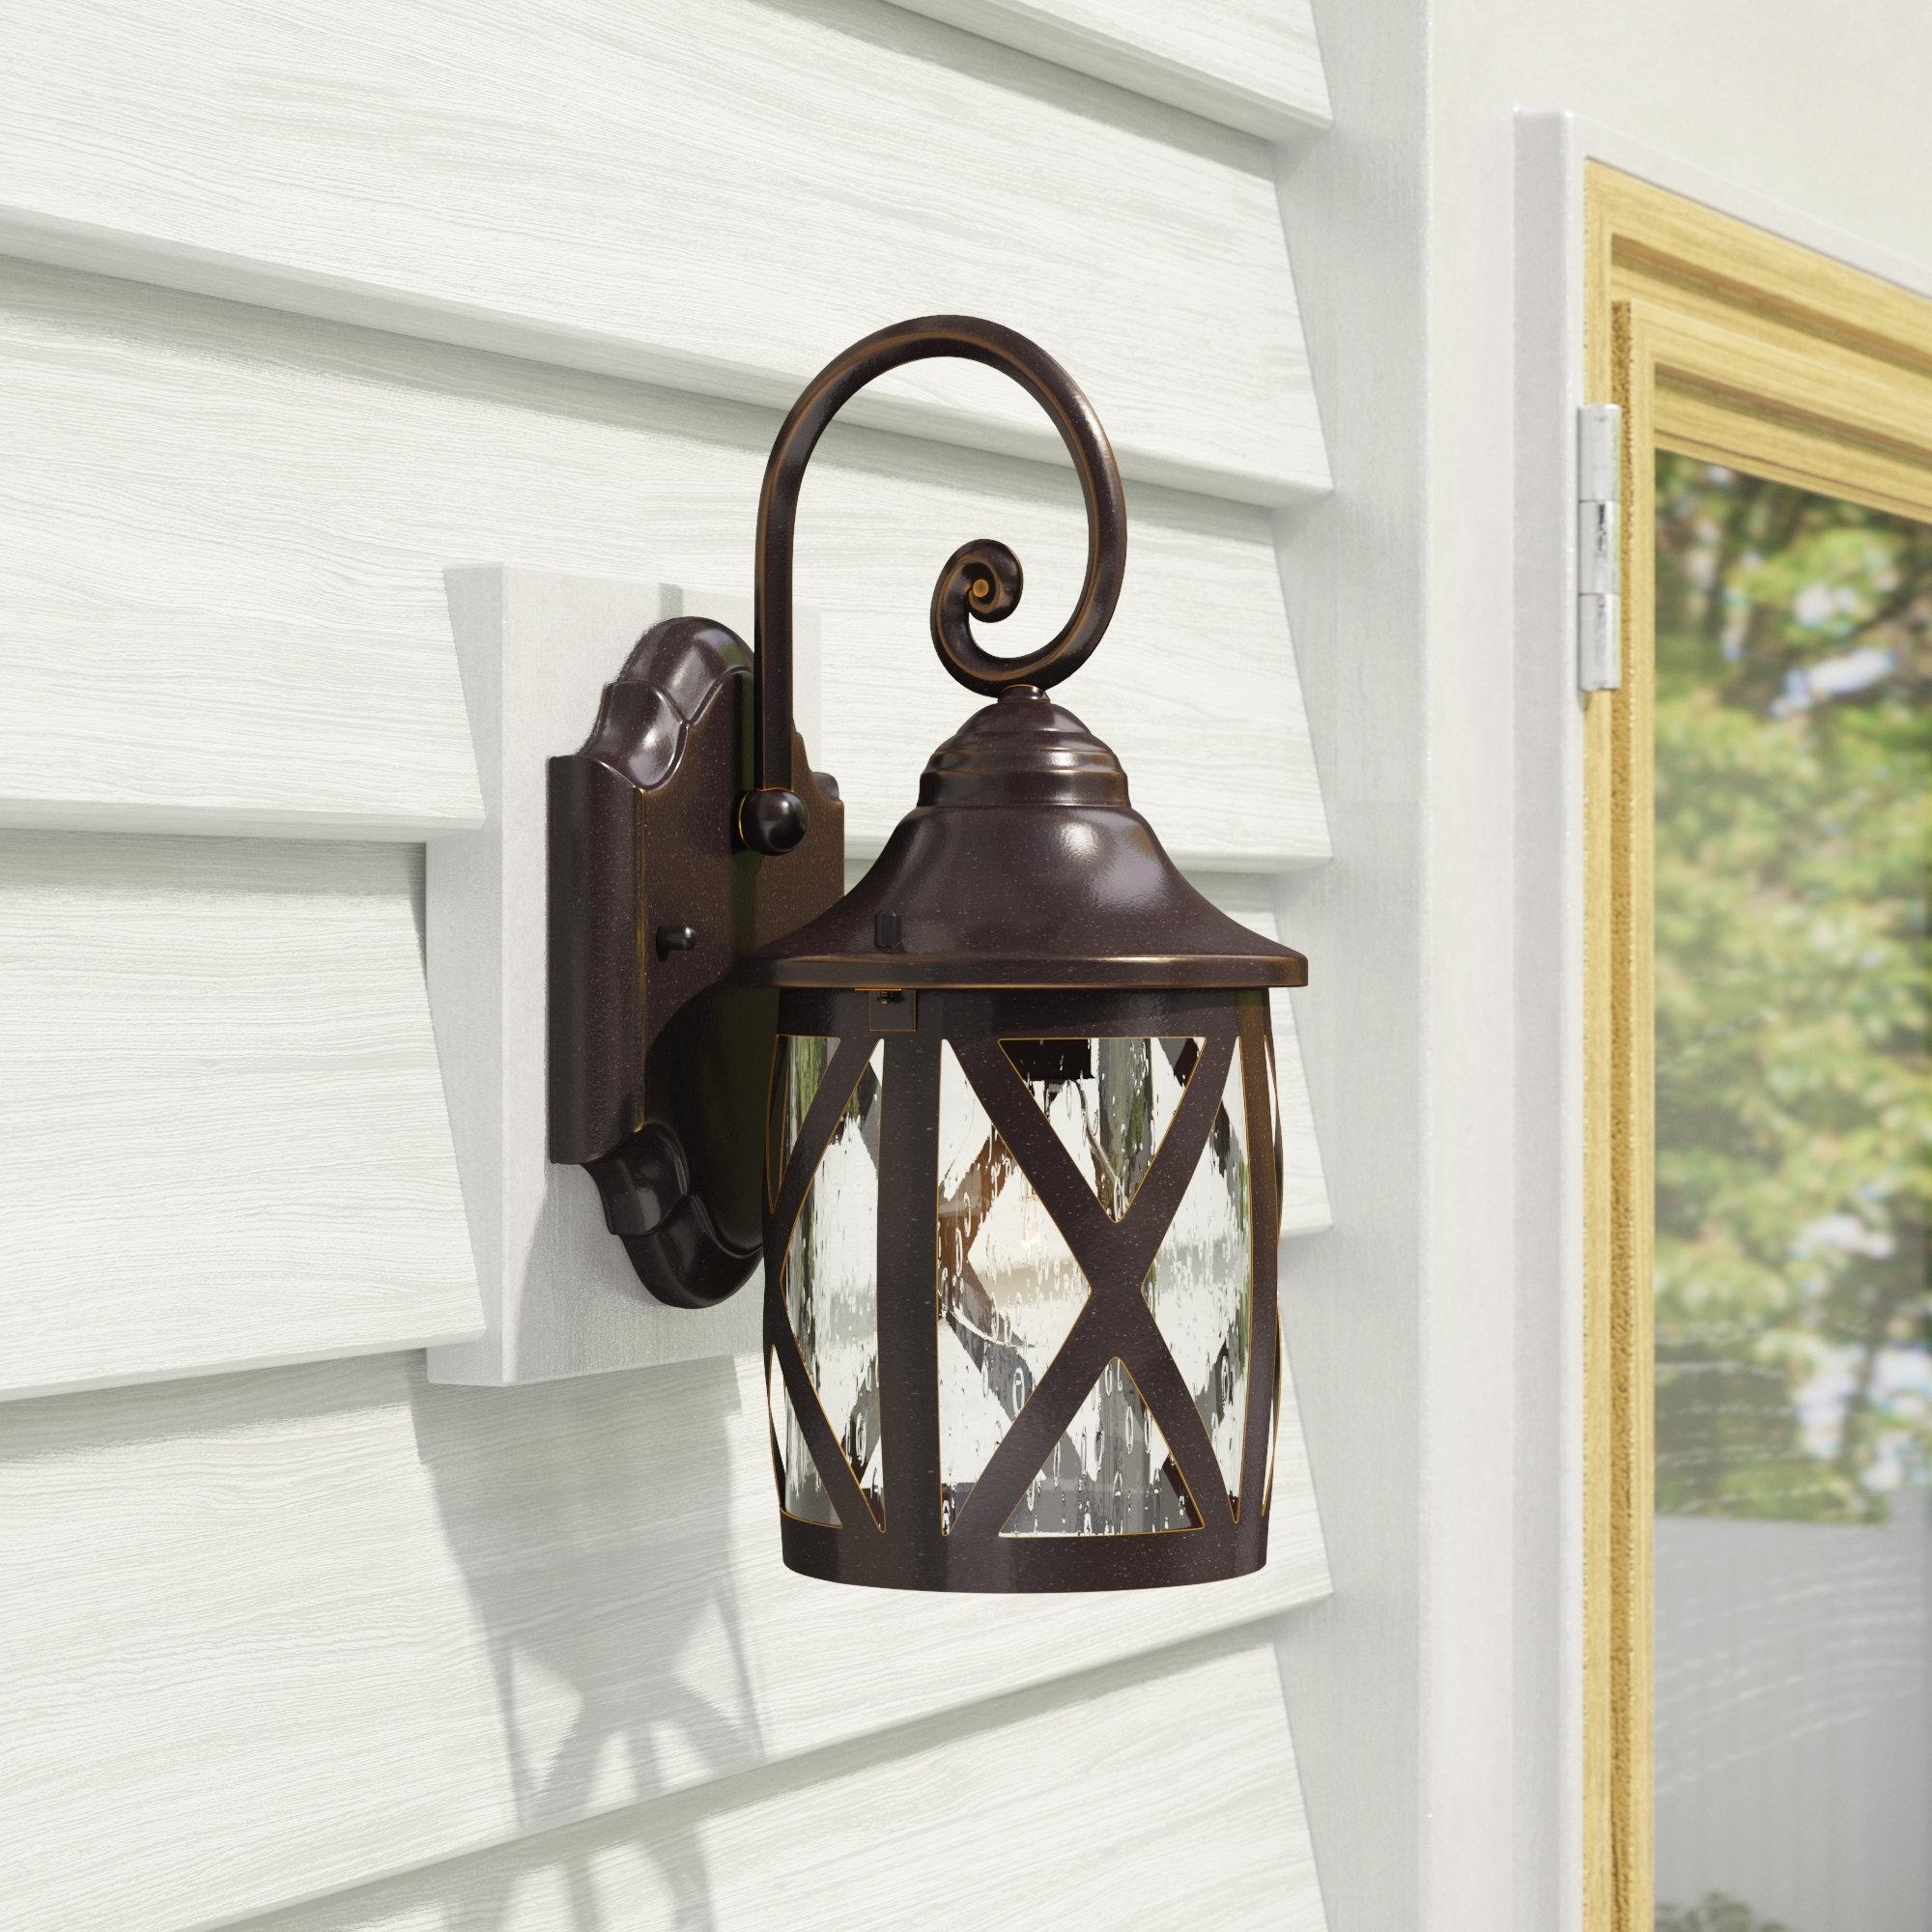 Laurel Foundry Modern Farmhouse Landon 1 Light Outdoor Wall Lantern With Regard To Fashionable Outdoor Vinyl Lanterns (View 7 of 20)